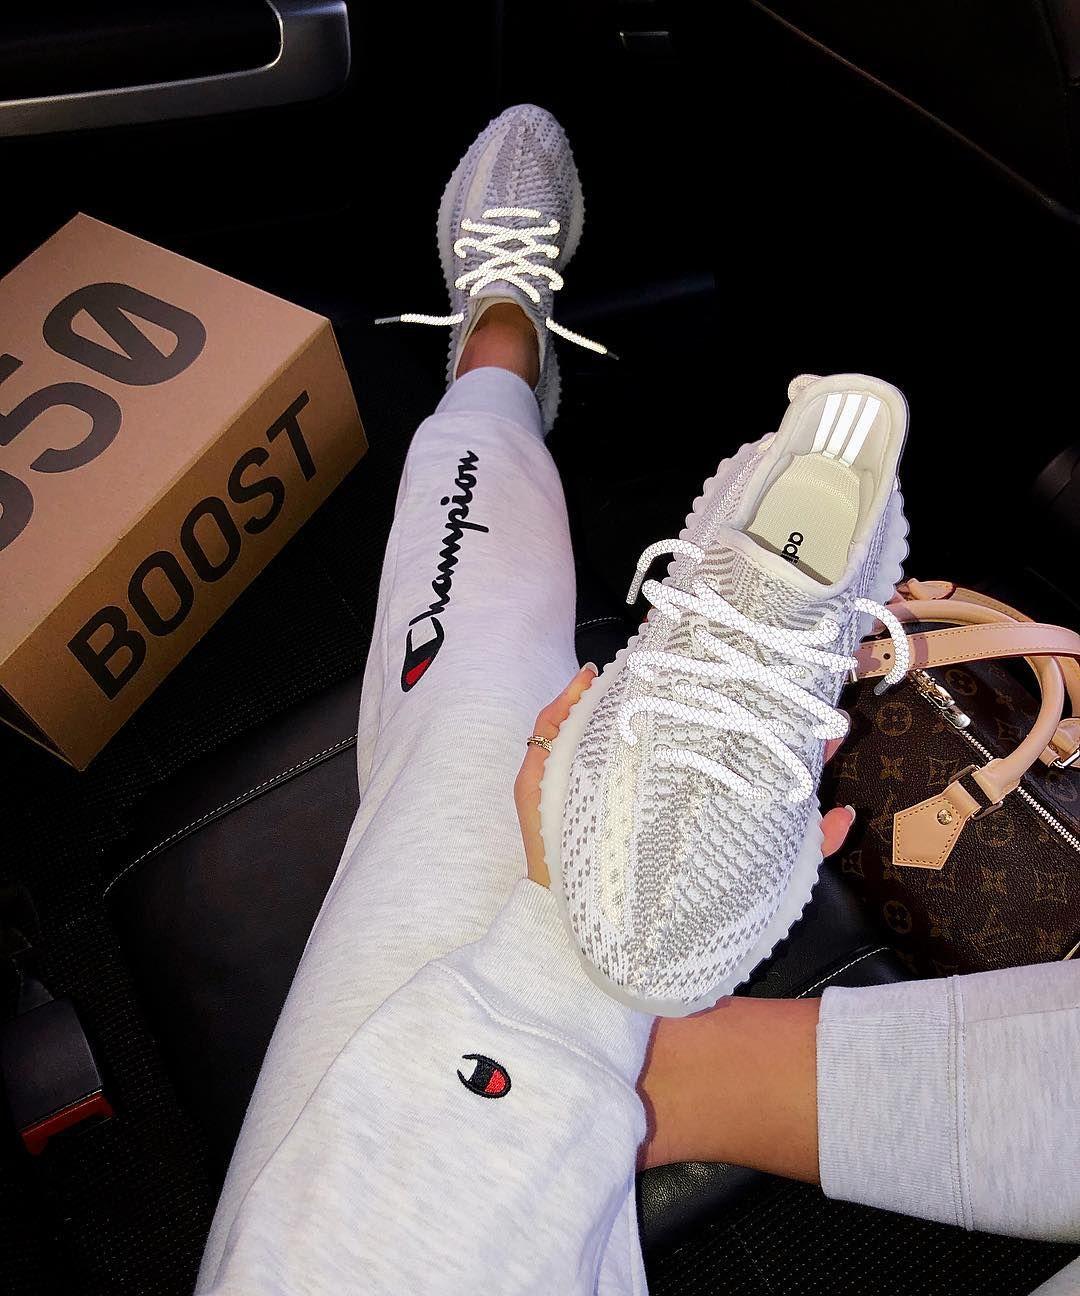 yeezy adidas instagram